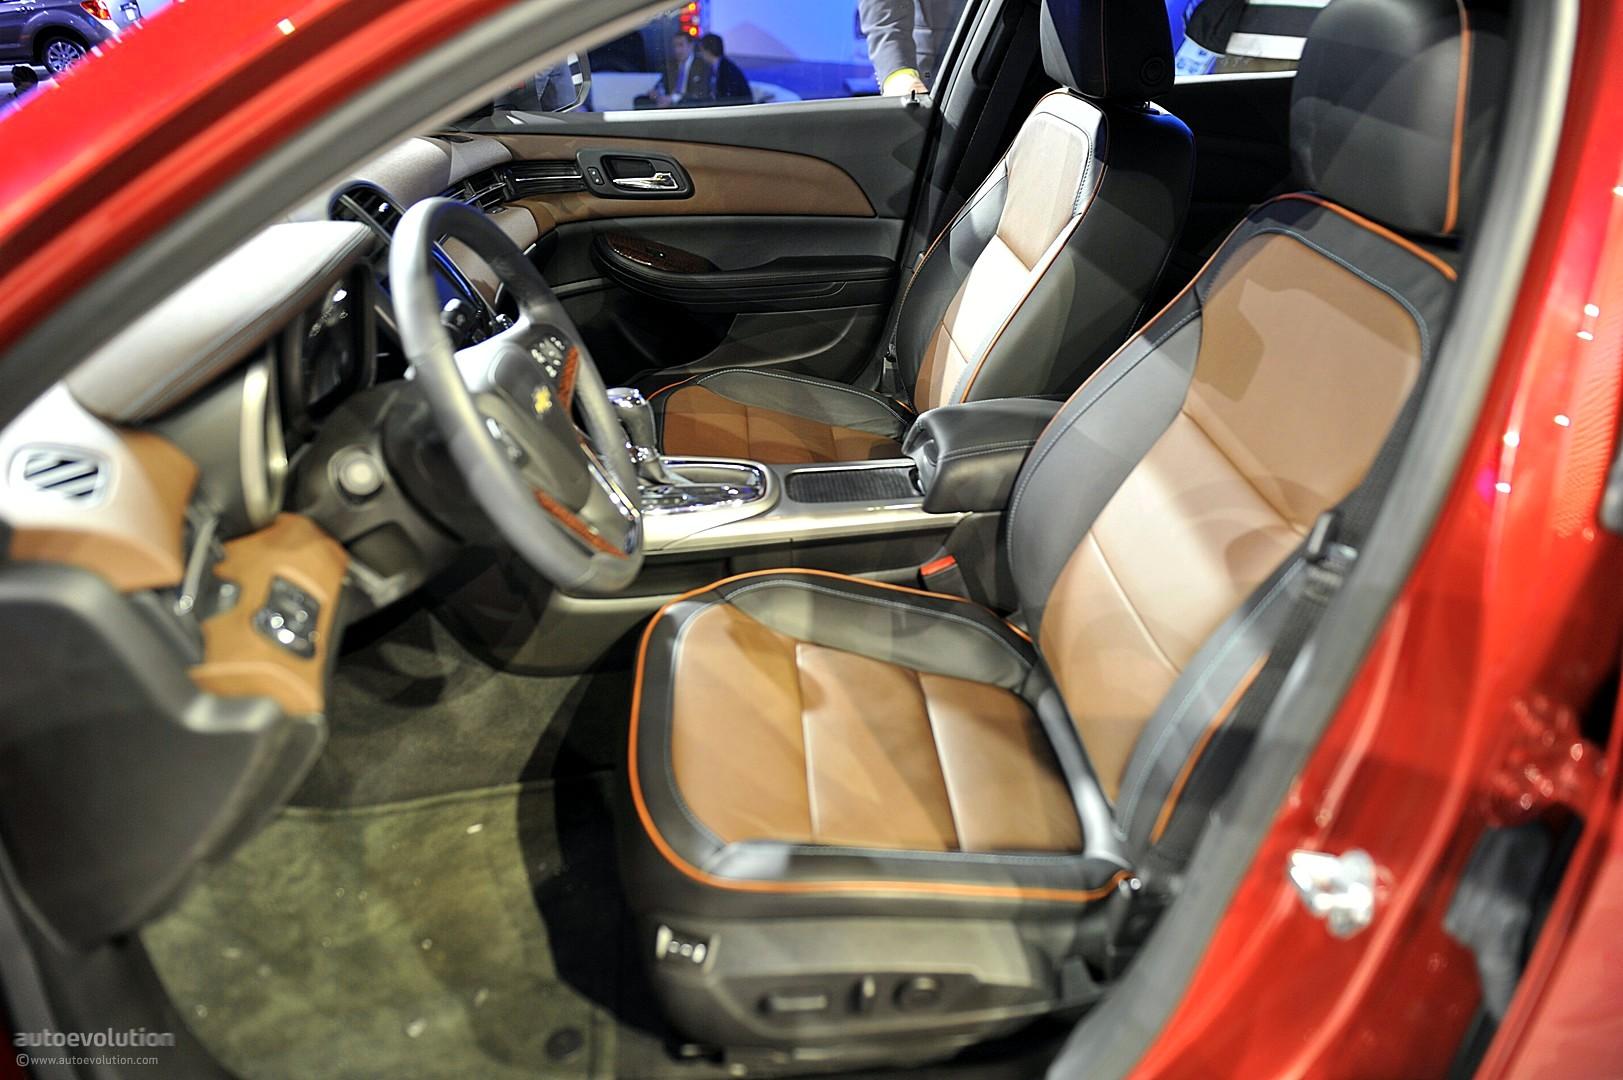 Malibu 2011 chevy malibu seat covers : 2011 NYIAS: 2013 Chevrolet Malibu [Live Photos] - autoevolution